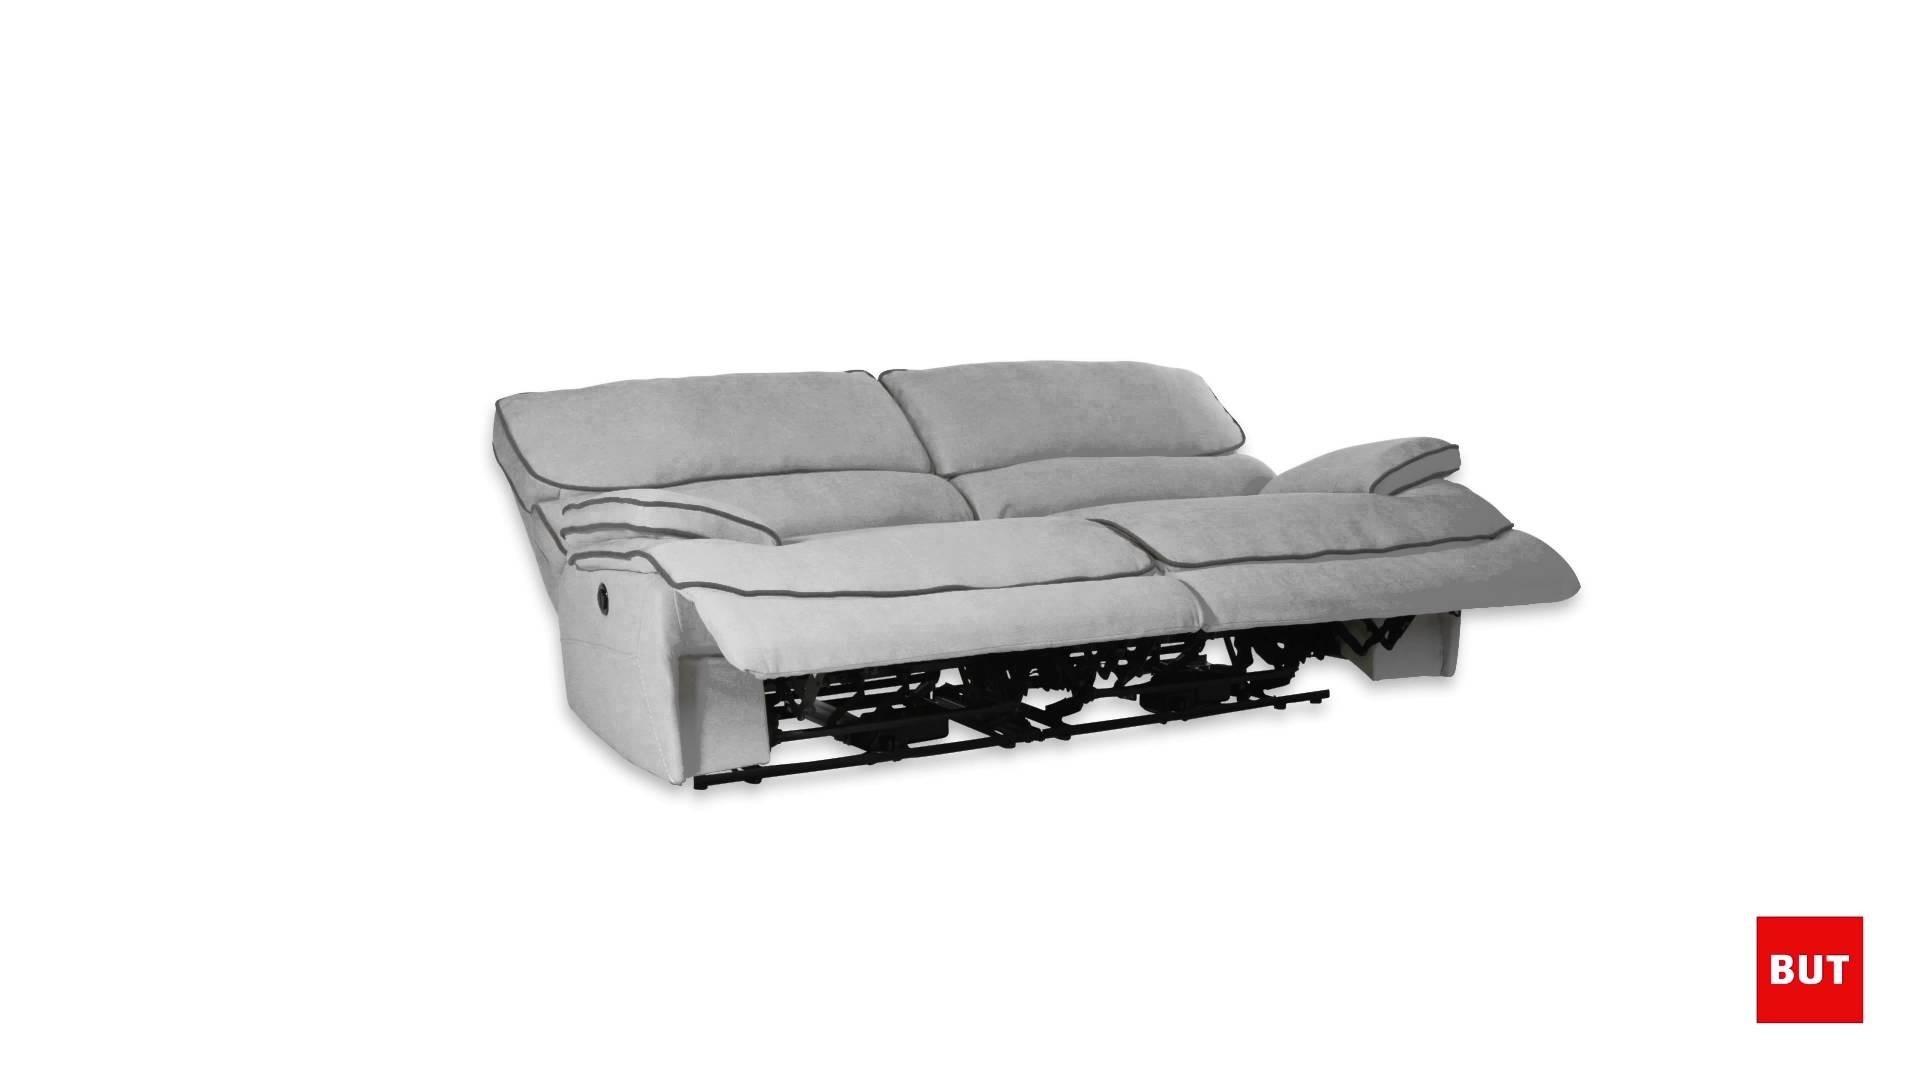 Ikea Canapé Convertible Angle Impressionnant Image Lit Armoire Canapé Beautiful Canap En U Convertible 12 Full Canape D